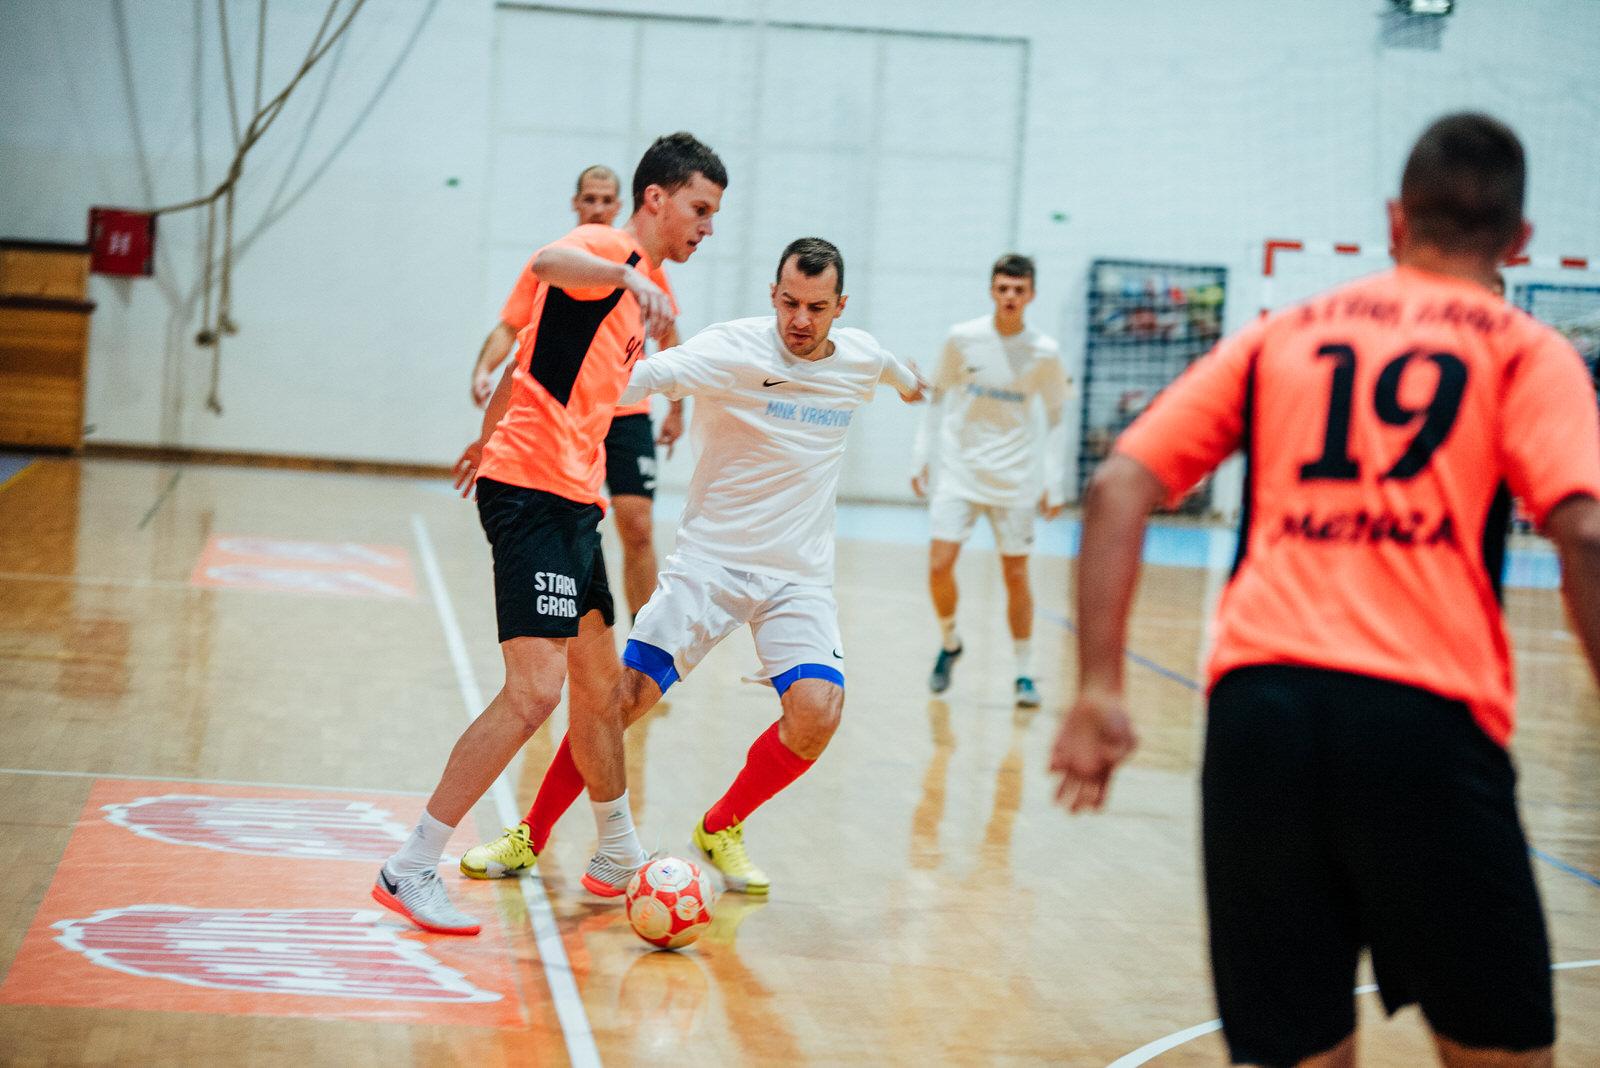 likaclub_otočac_memorijalni-malonogometni-turnir_2019-39